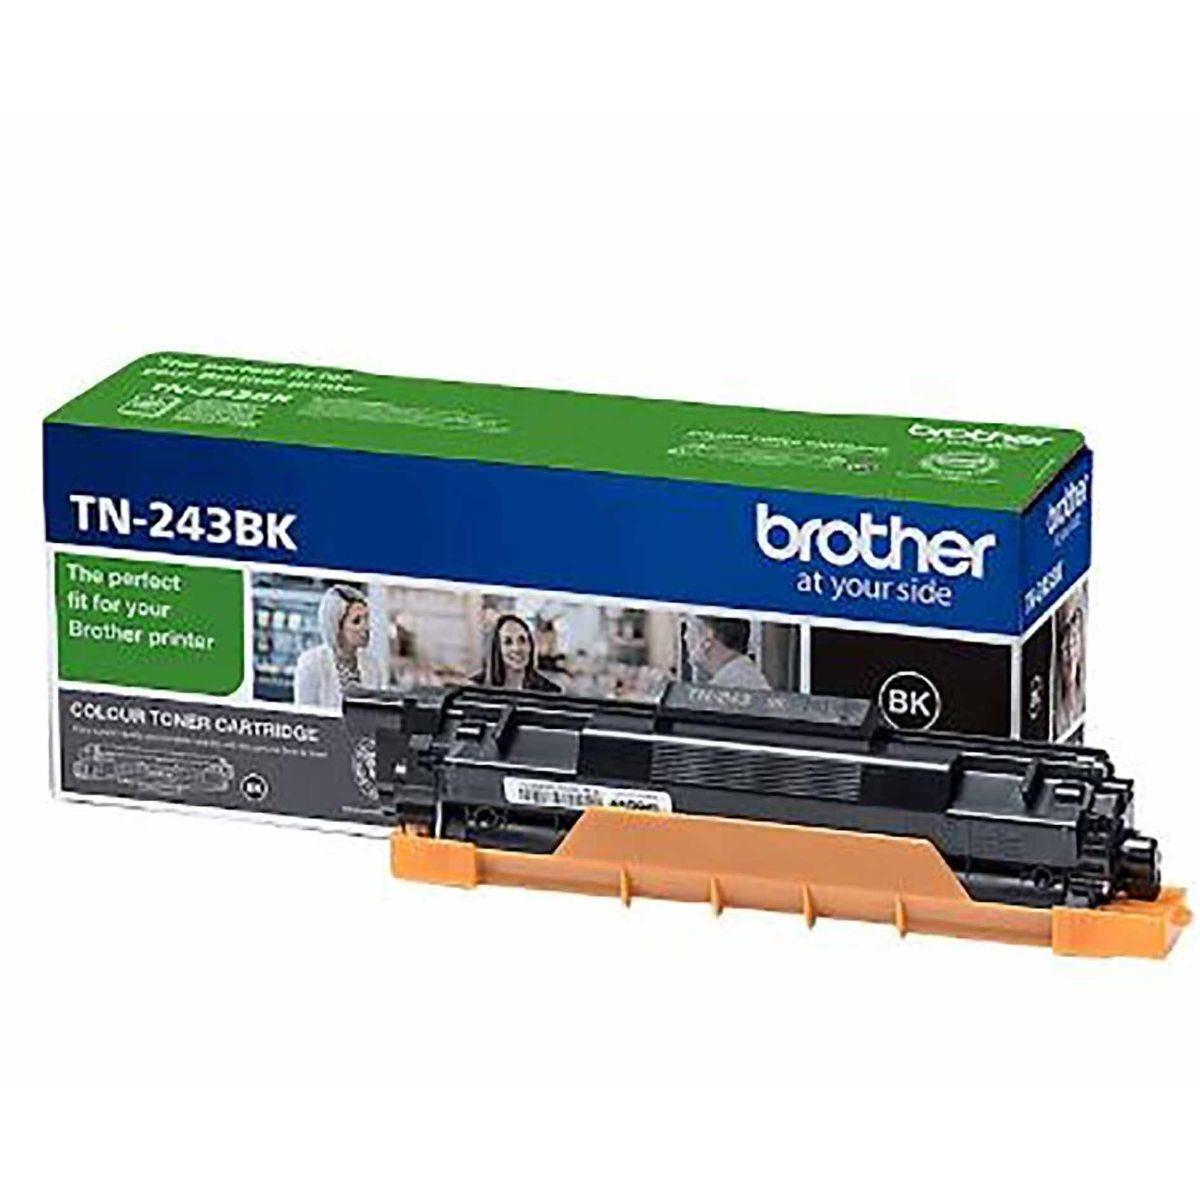 Brother TN243BK Black Original Toner Cartridge